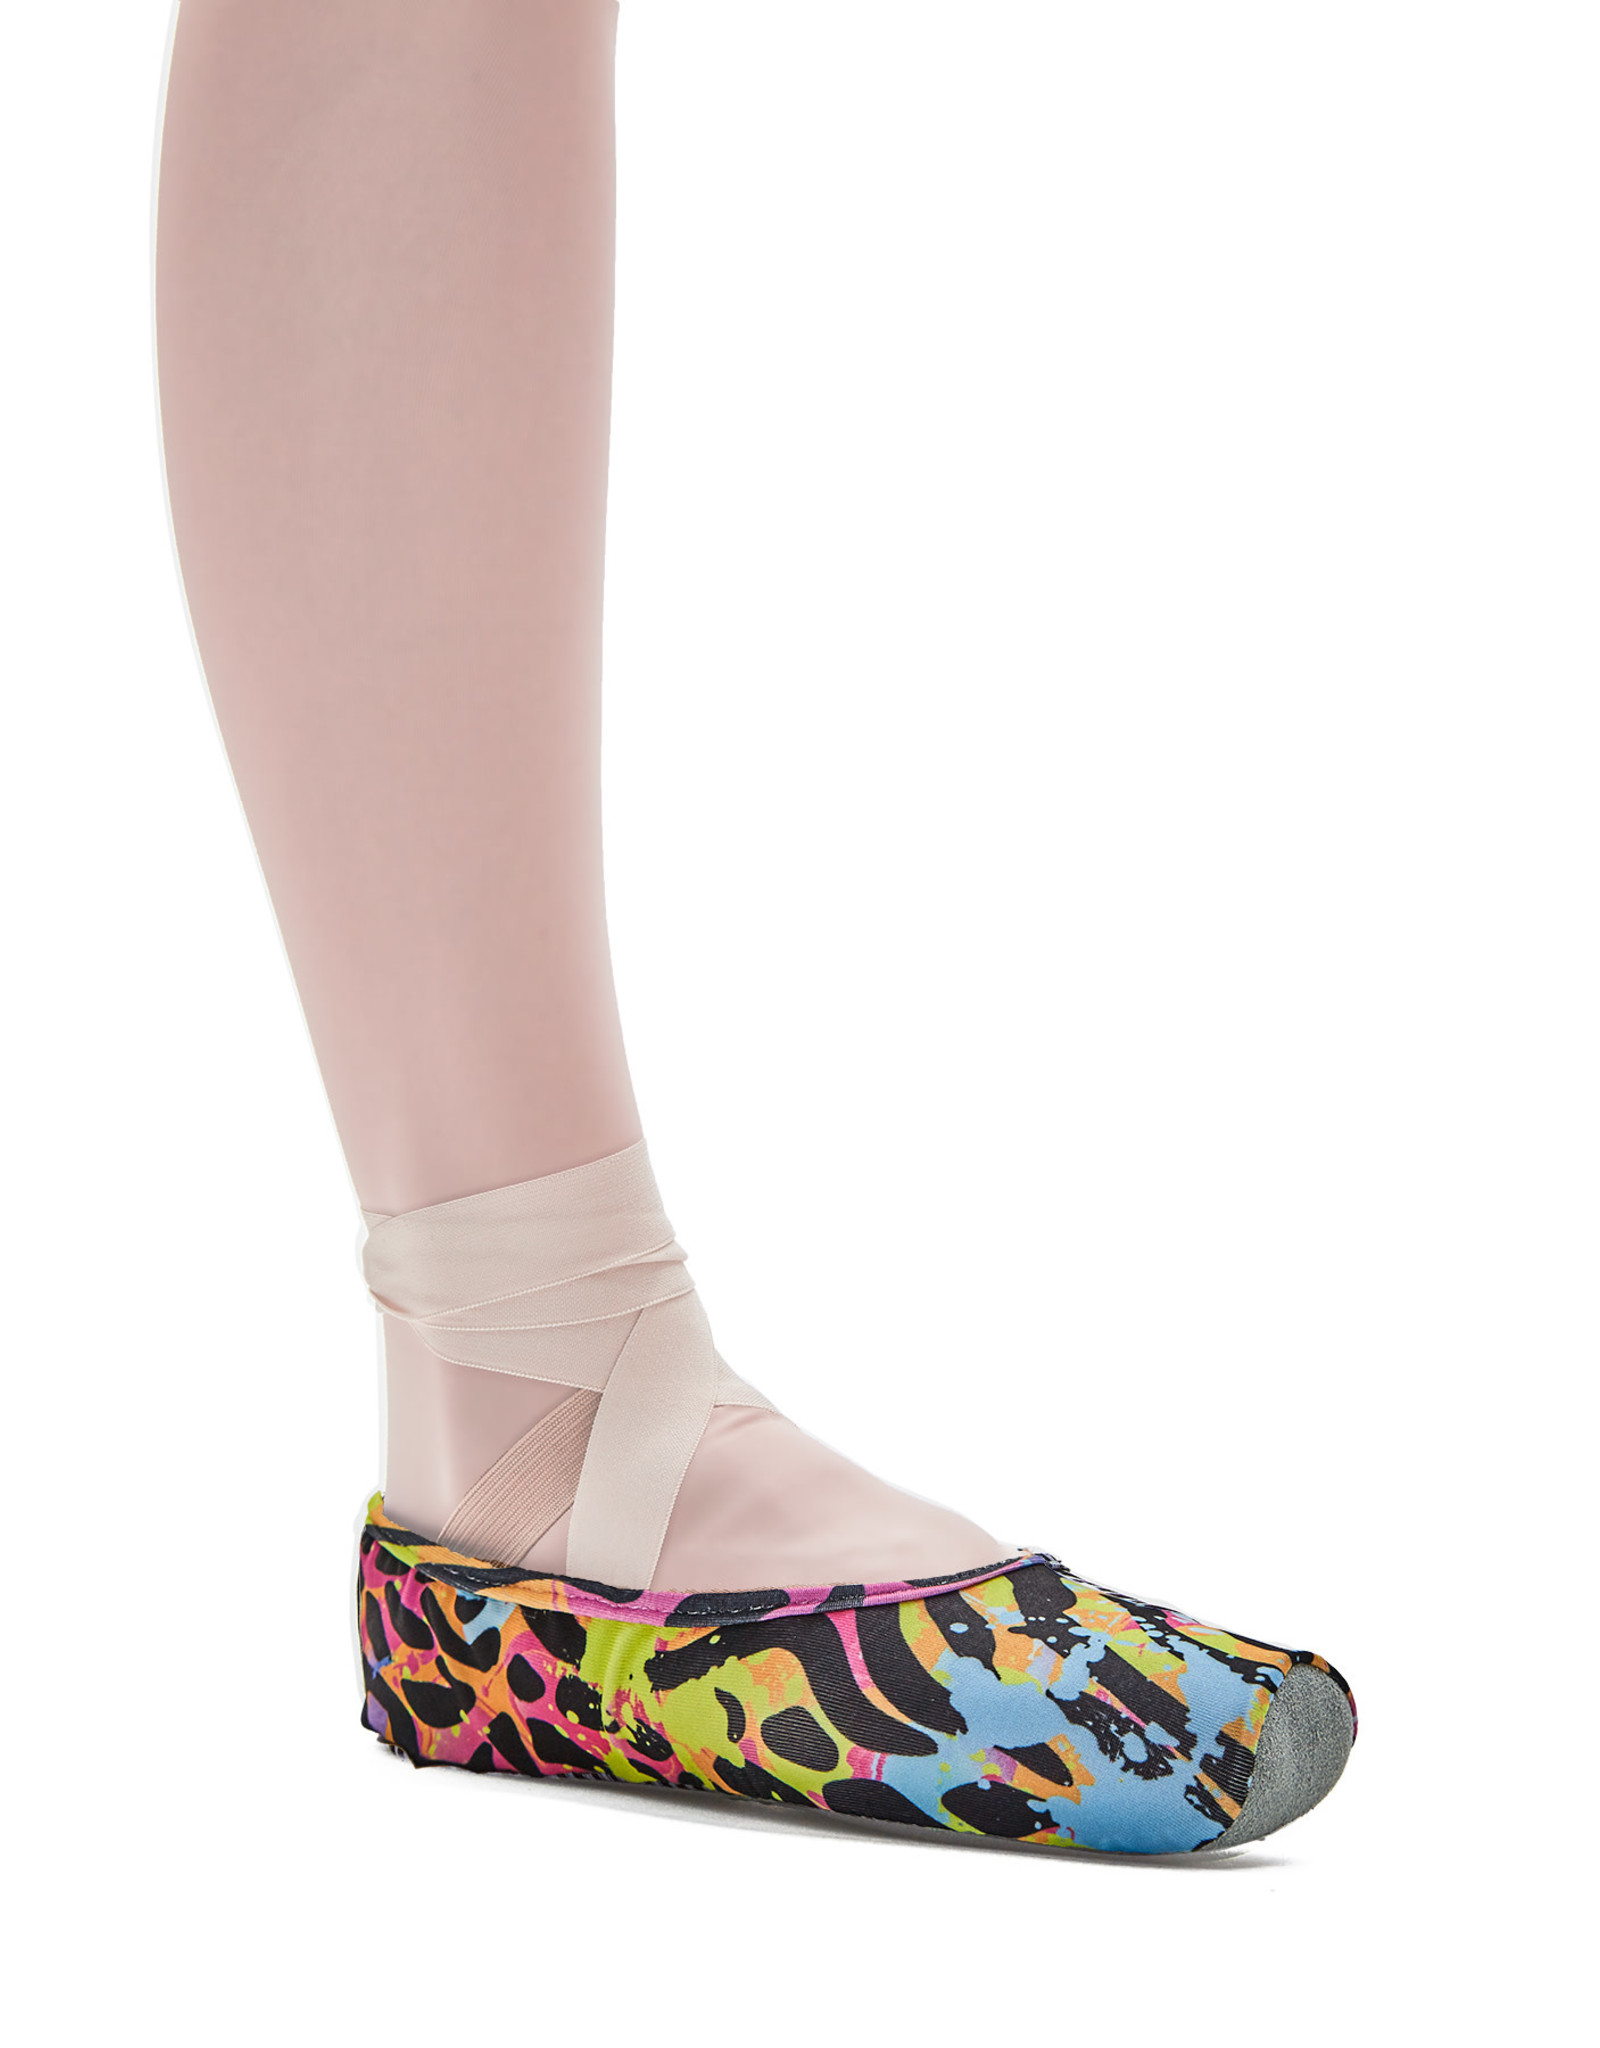 SoDanca Pointe Shoe Covers